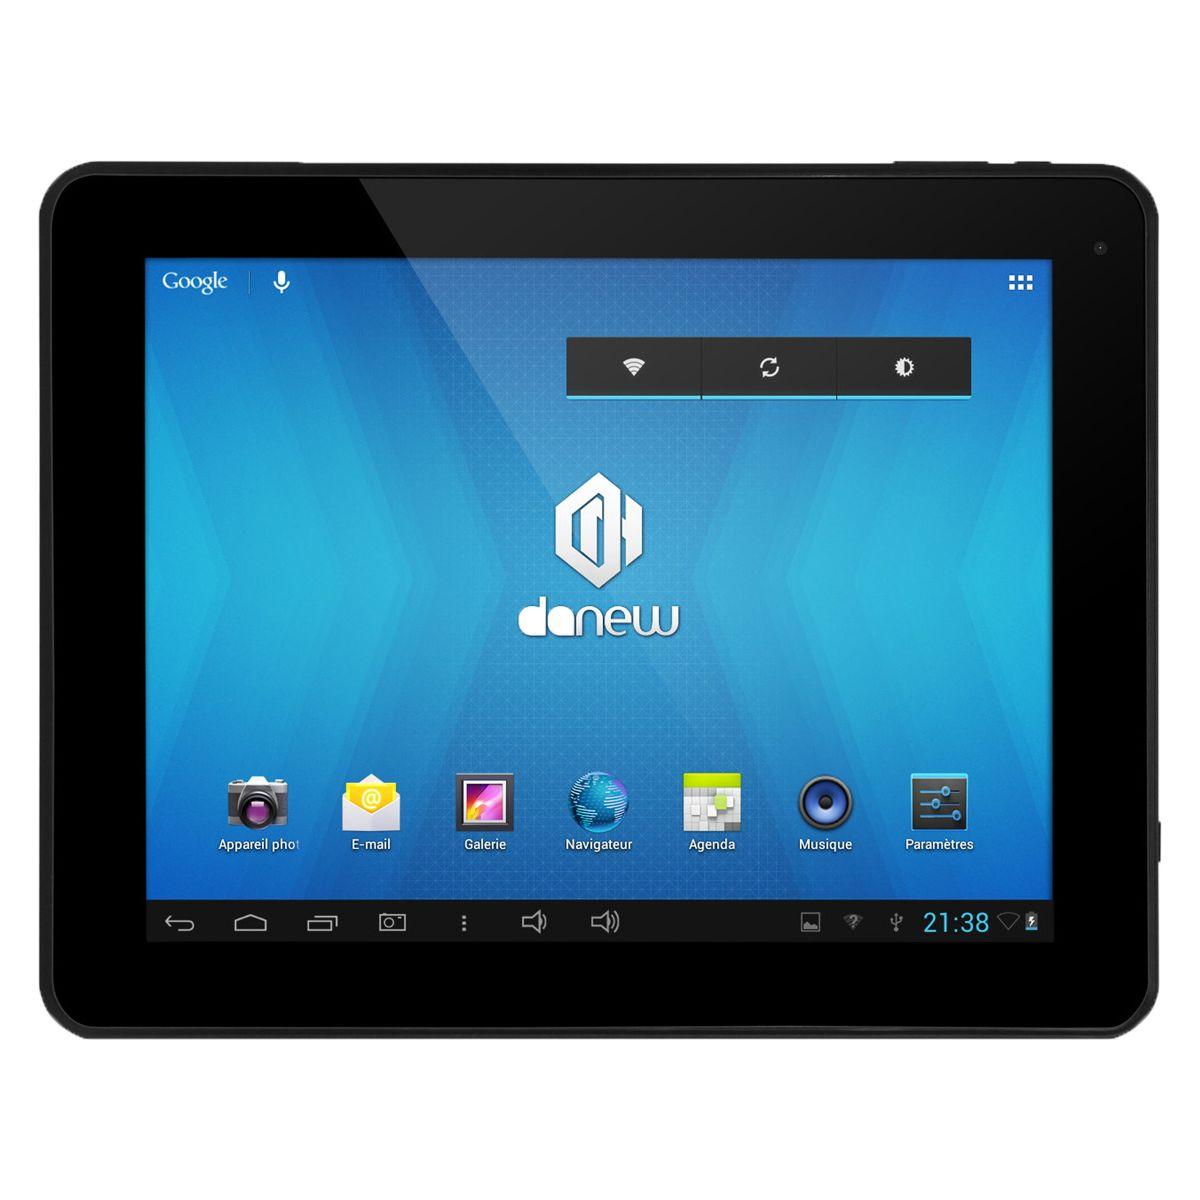 danew dslide 971dc 8 go tablette tactile 9 7 sous android jelly bean 4 2 2 comparer avec. Black Bedroom Furniture Sets. Home Design Ideas